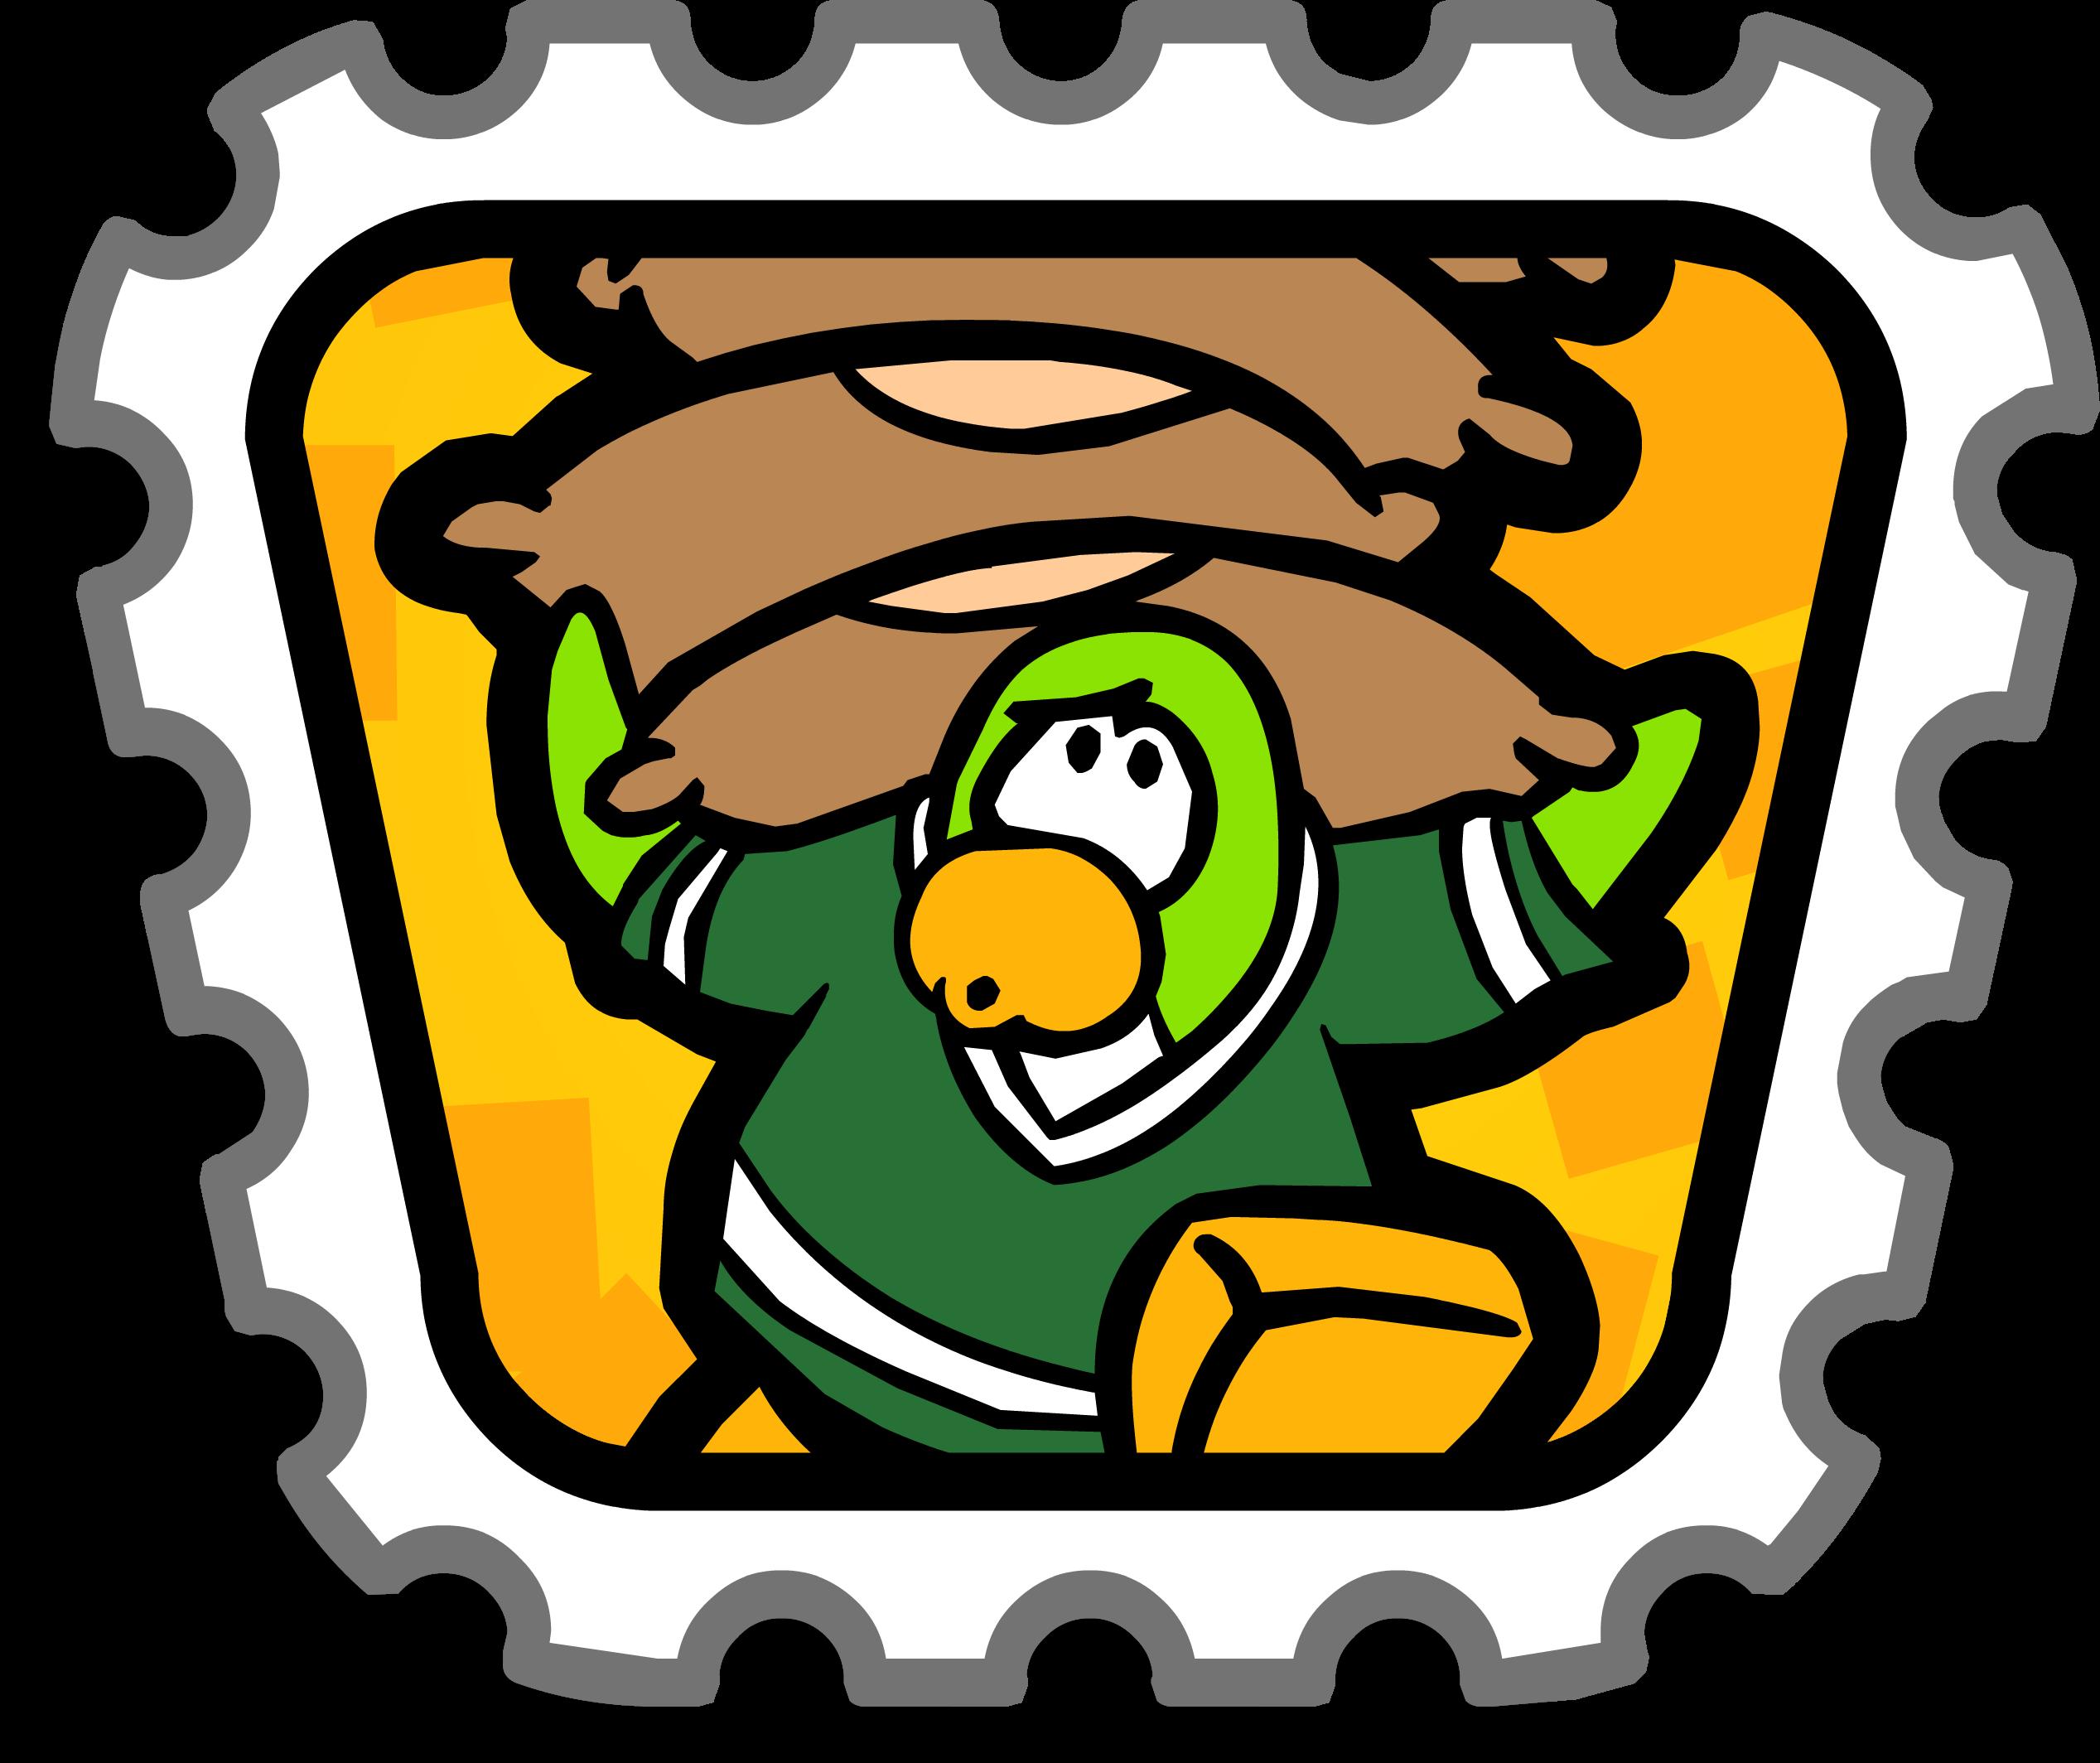 Games clipart bean bag race. Balance stamp club penguin